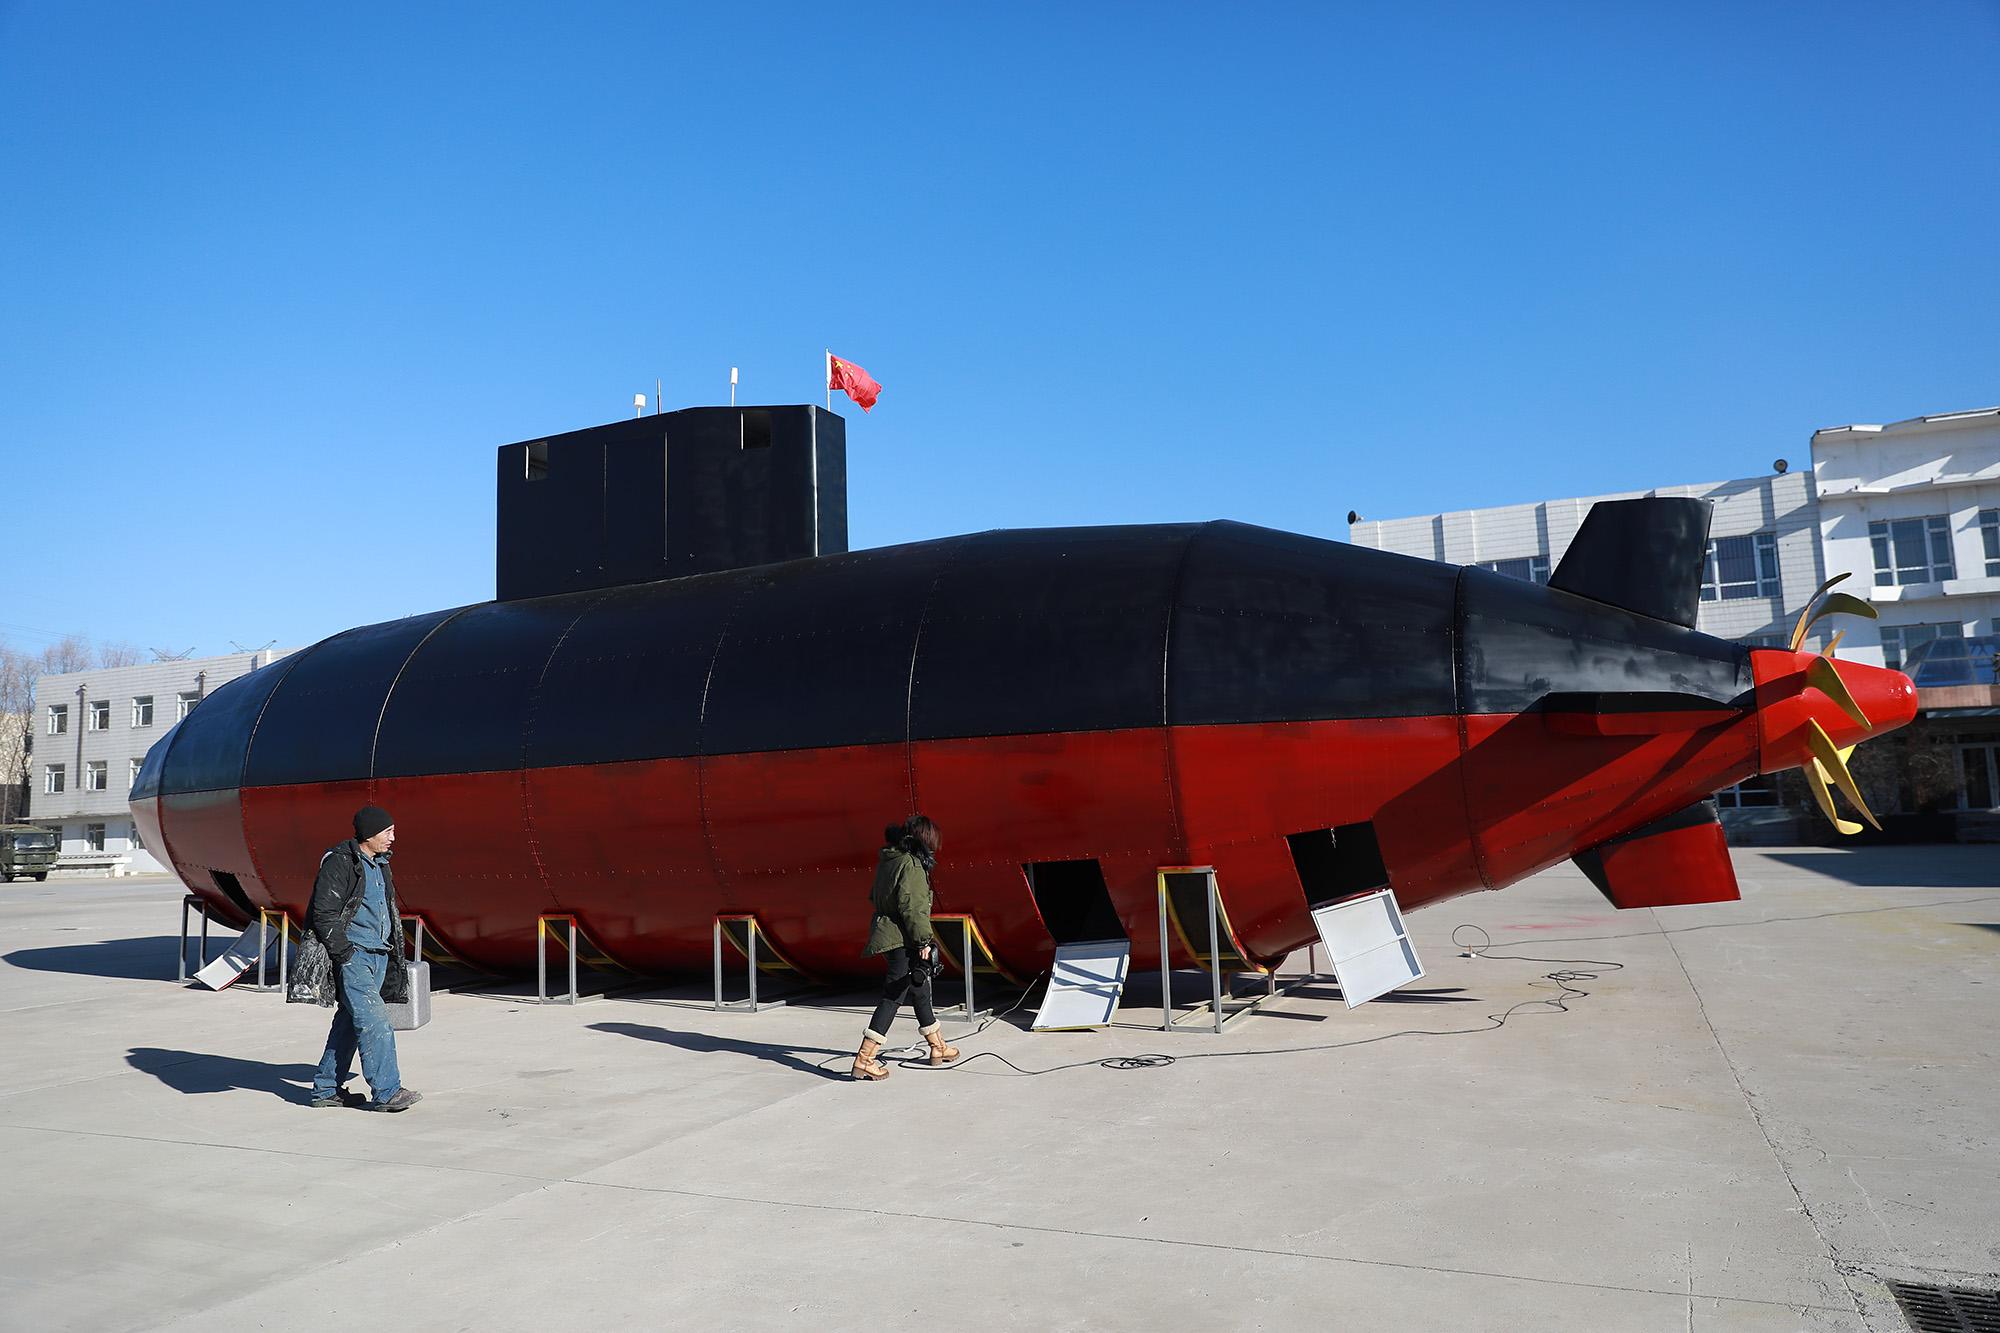 Noodle restaurant owner builds mock-up submarine in China